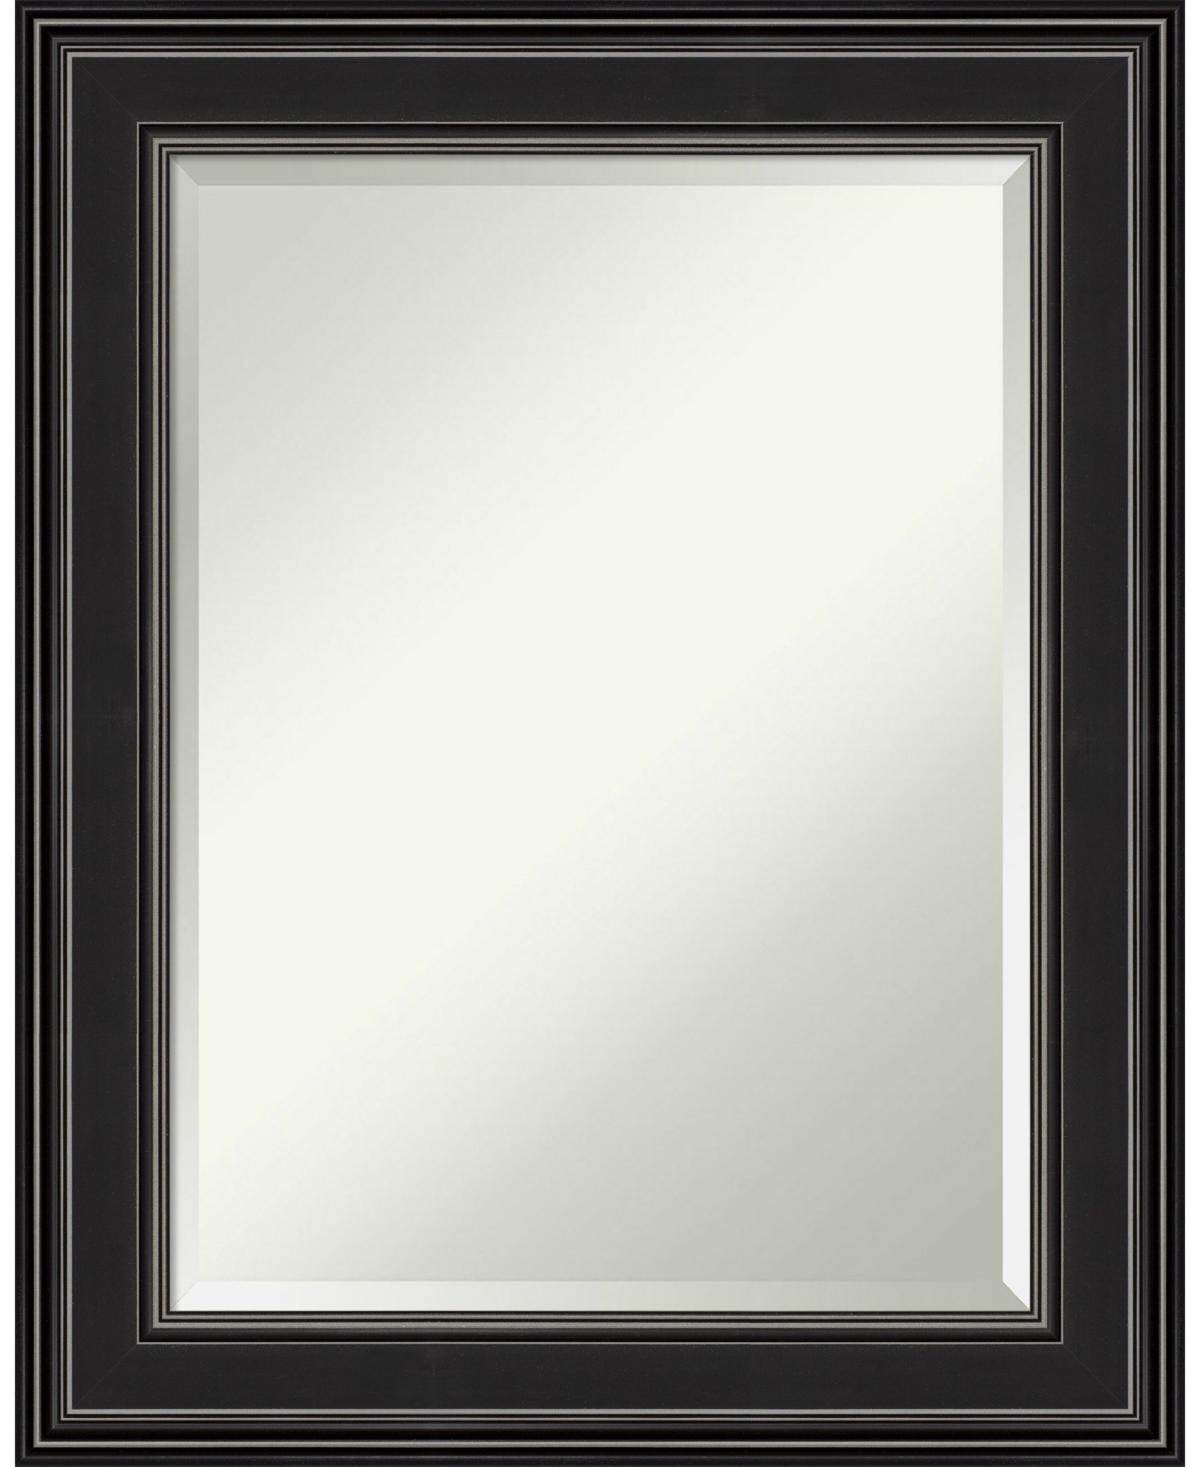 Amanti Art Ridge Framed Bathroom Vanity Wall Mirror, 23.75